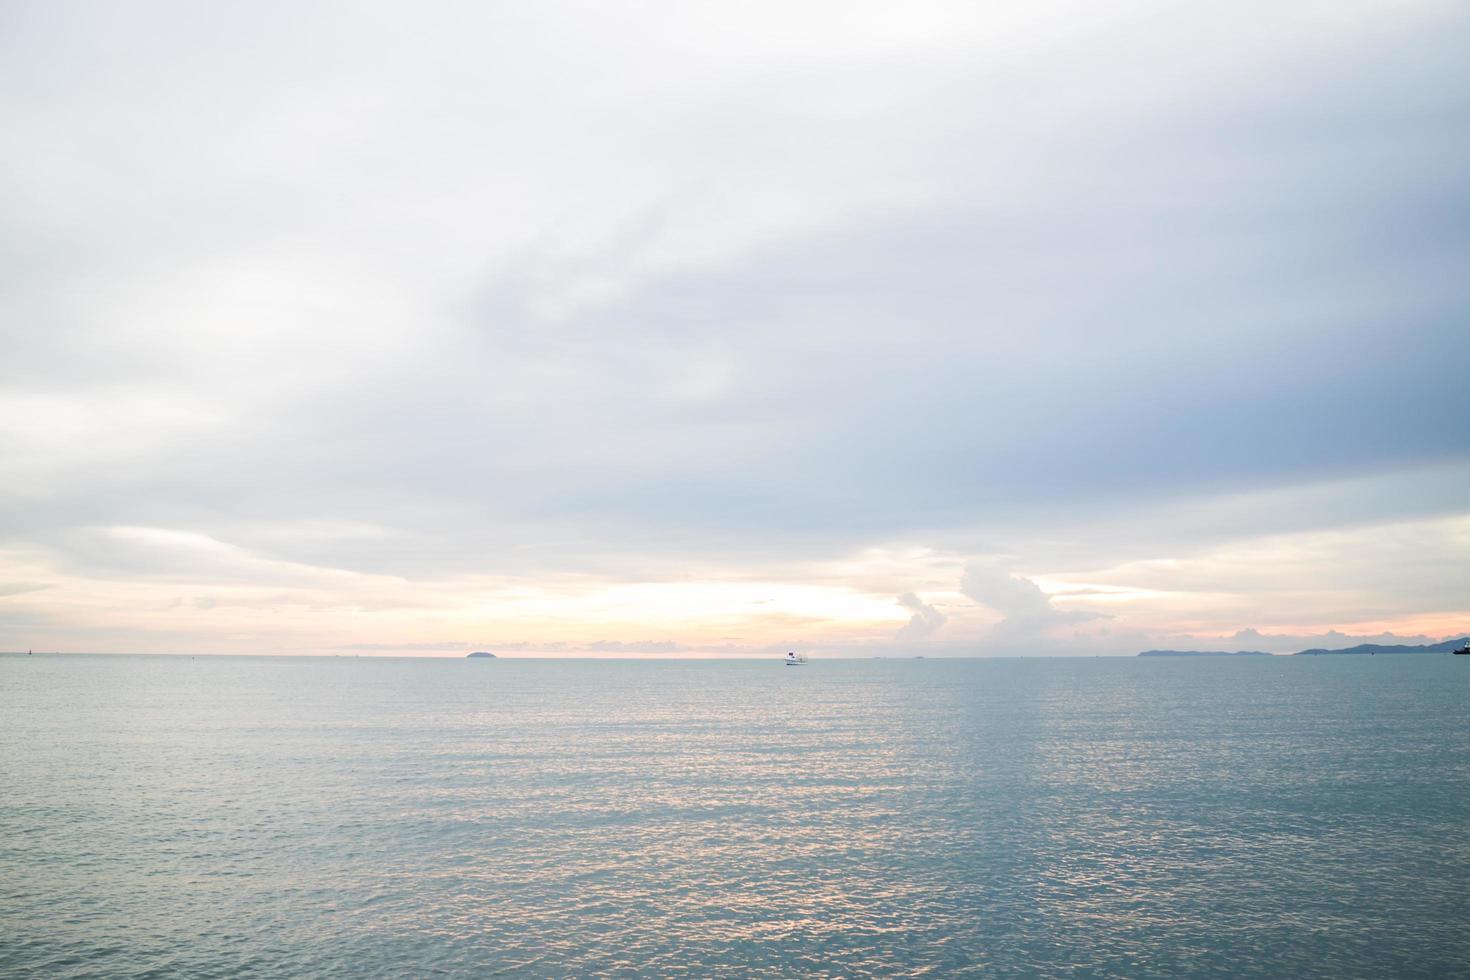 relajante vista al mar azul profundo foto